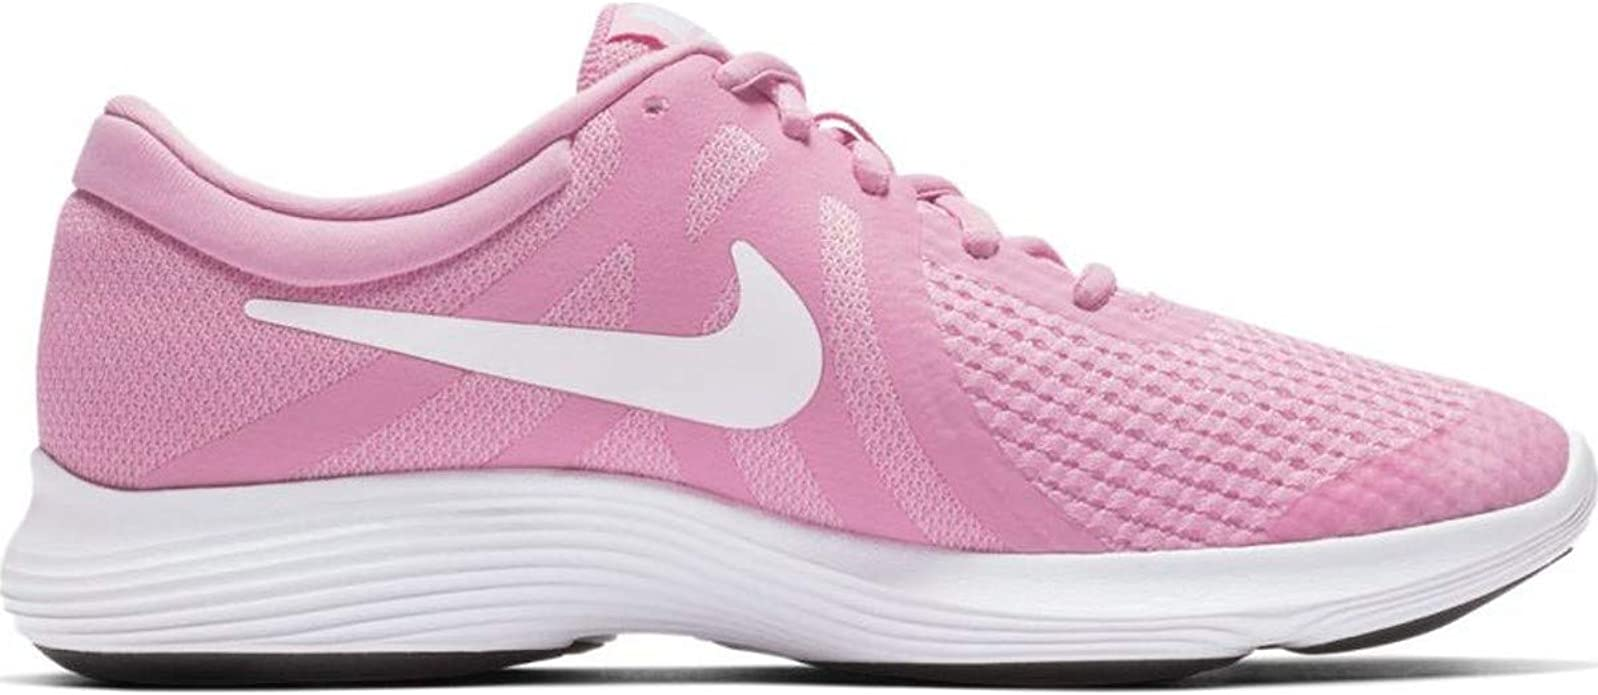 Zapatilla niña Running Nike Revolution 4 (GS). 943306-603. Talla 37.5 EU: Amazon.es: Zapatos y complementos